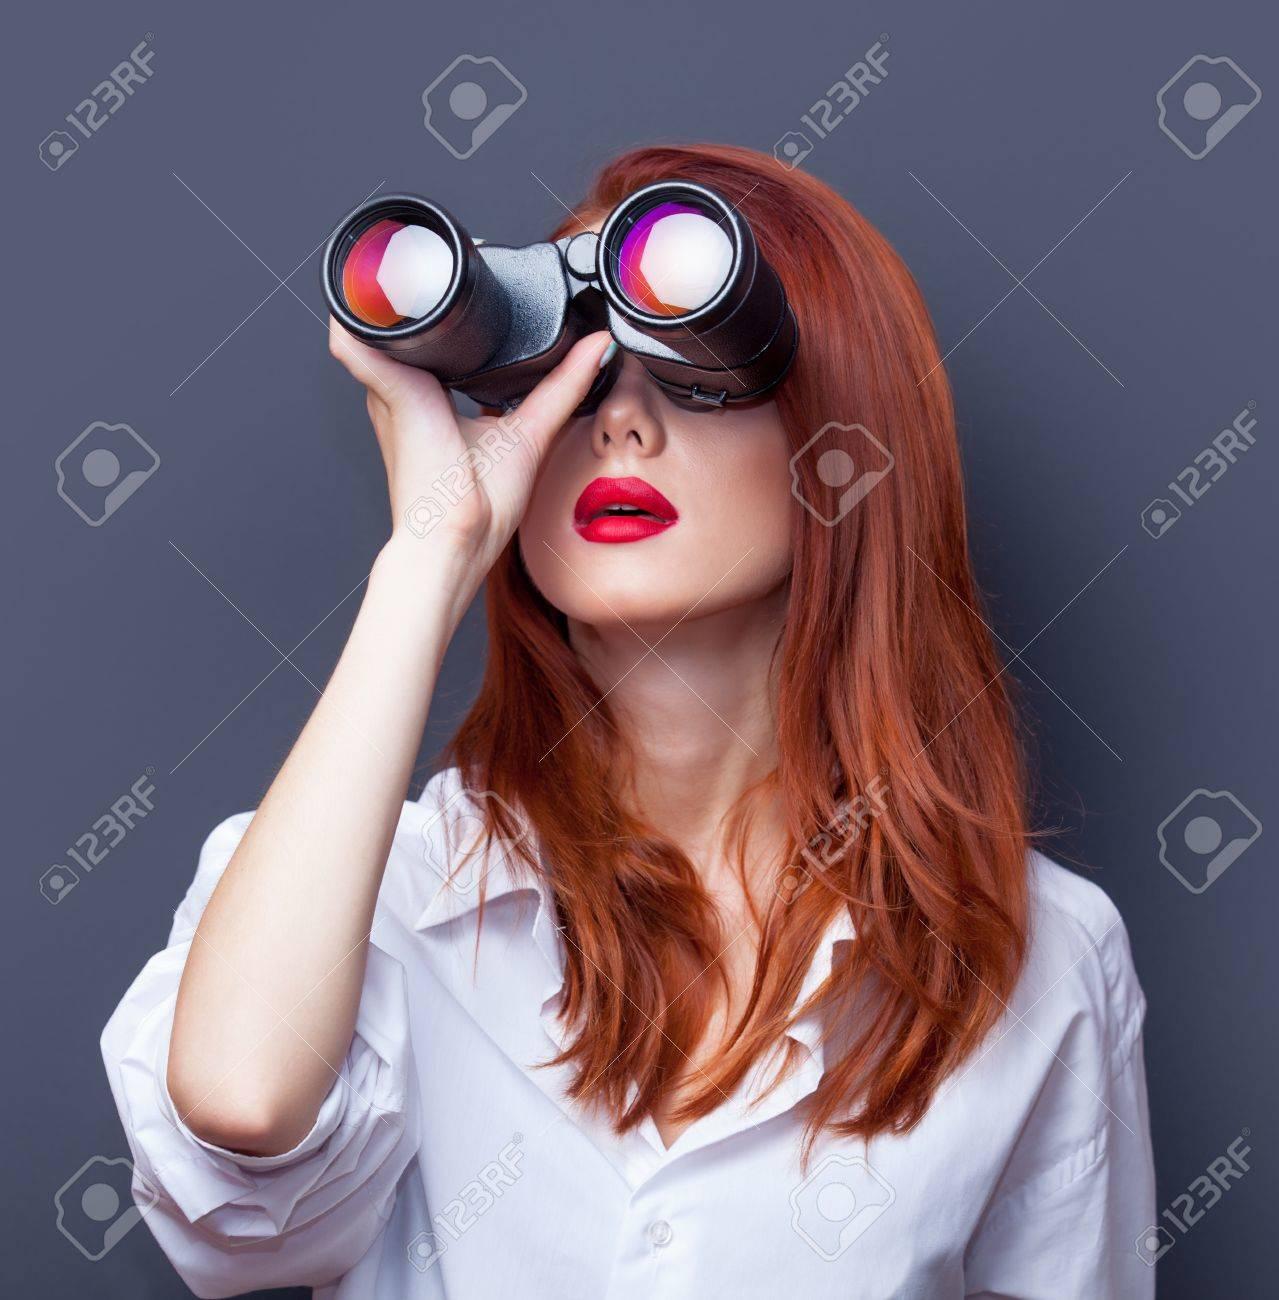 Portrait of a surprised businesswomen in white shirt with binocular on grey background. - 44029624